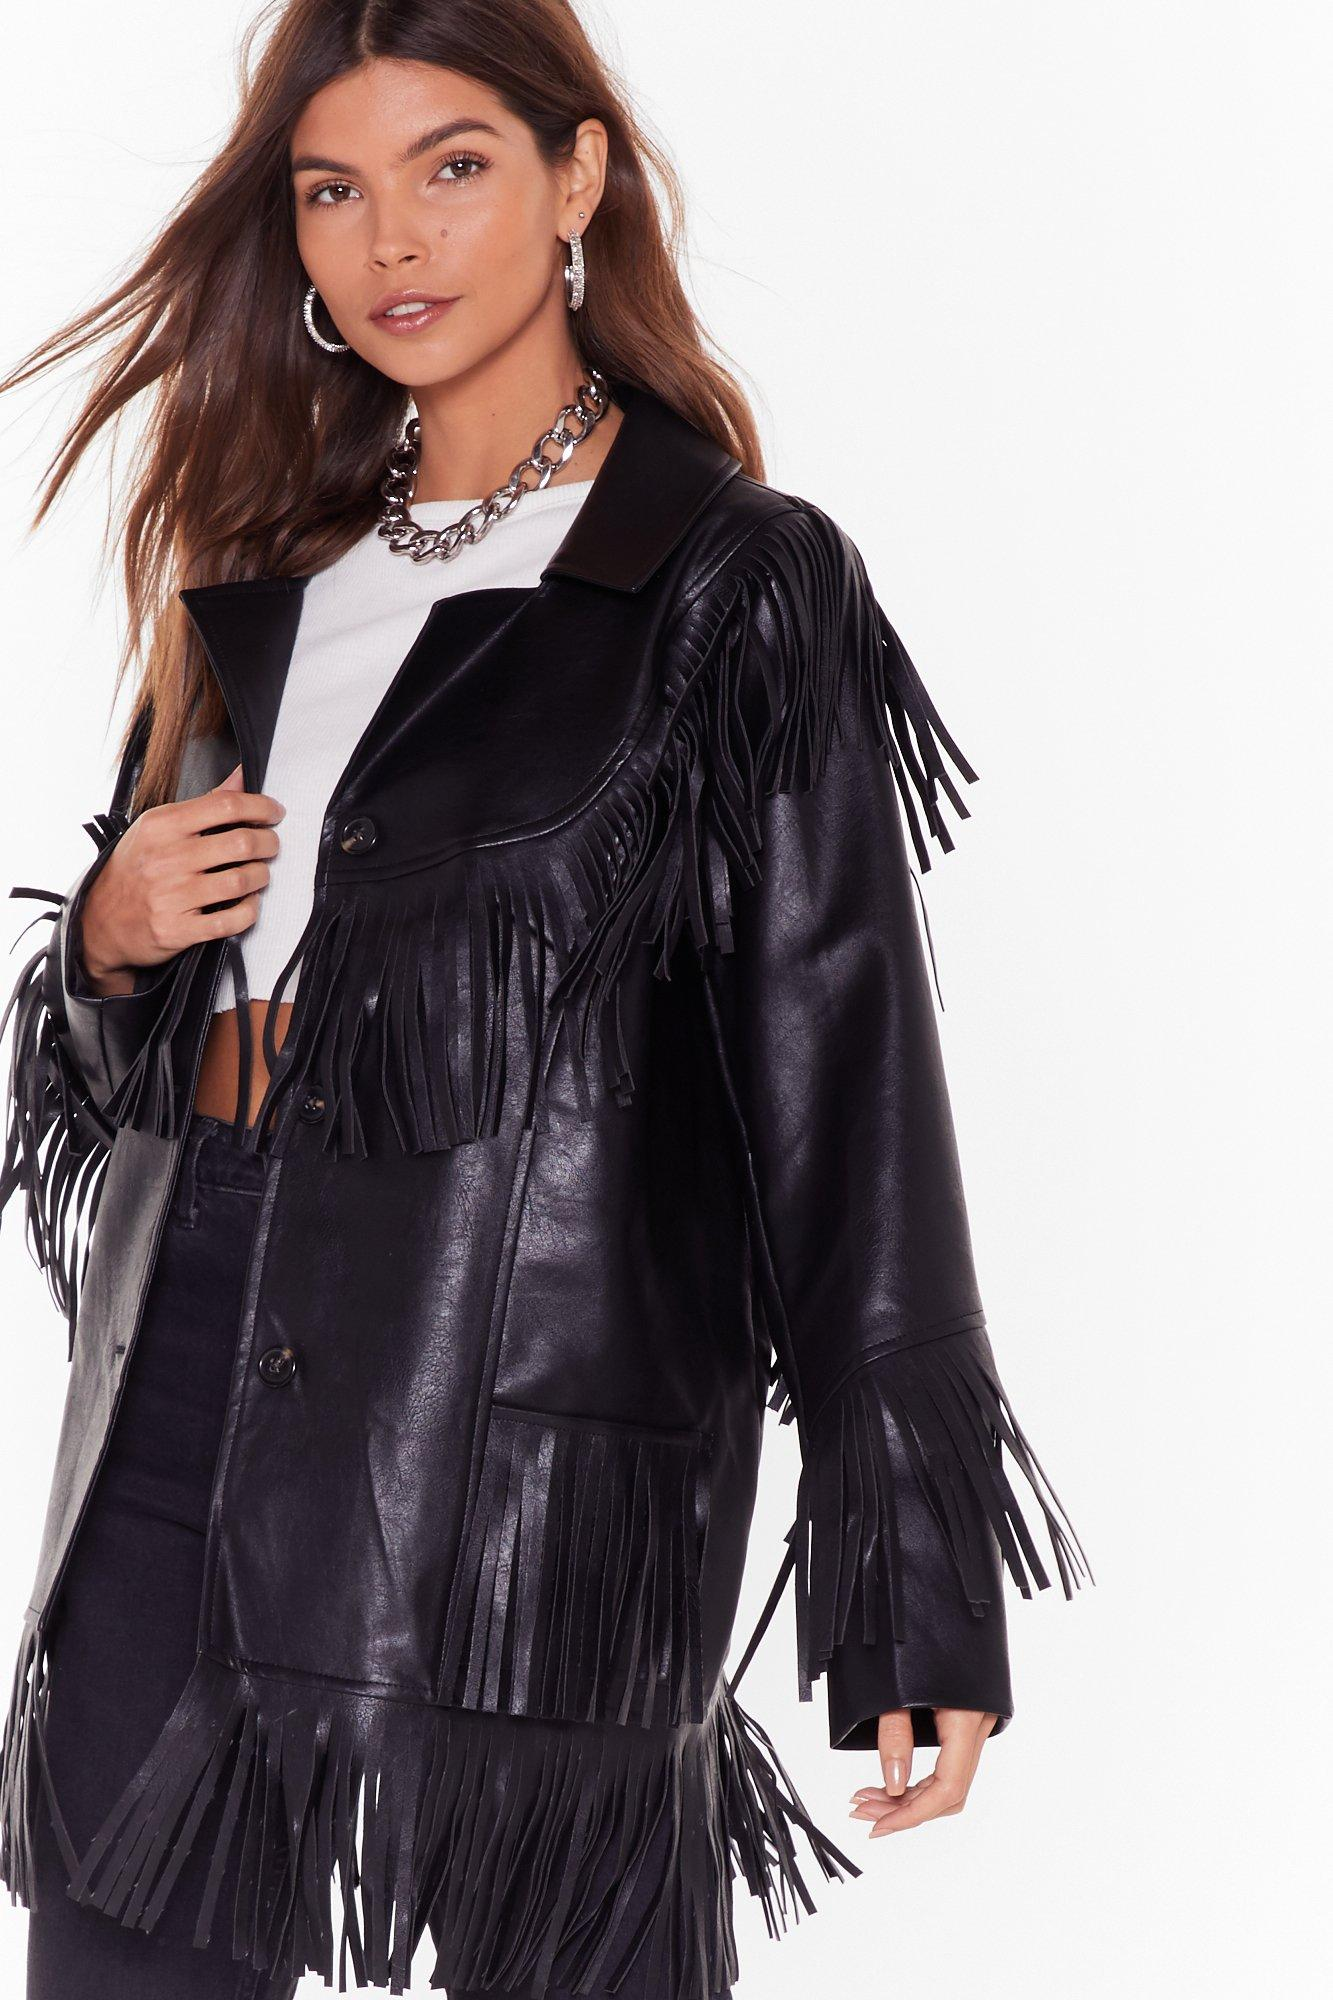 Image of Leather Going Back Fringed Faux Leather Jacket